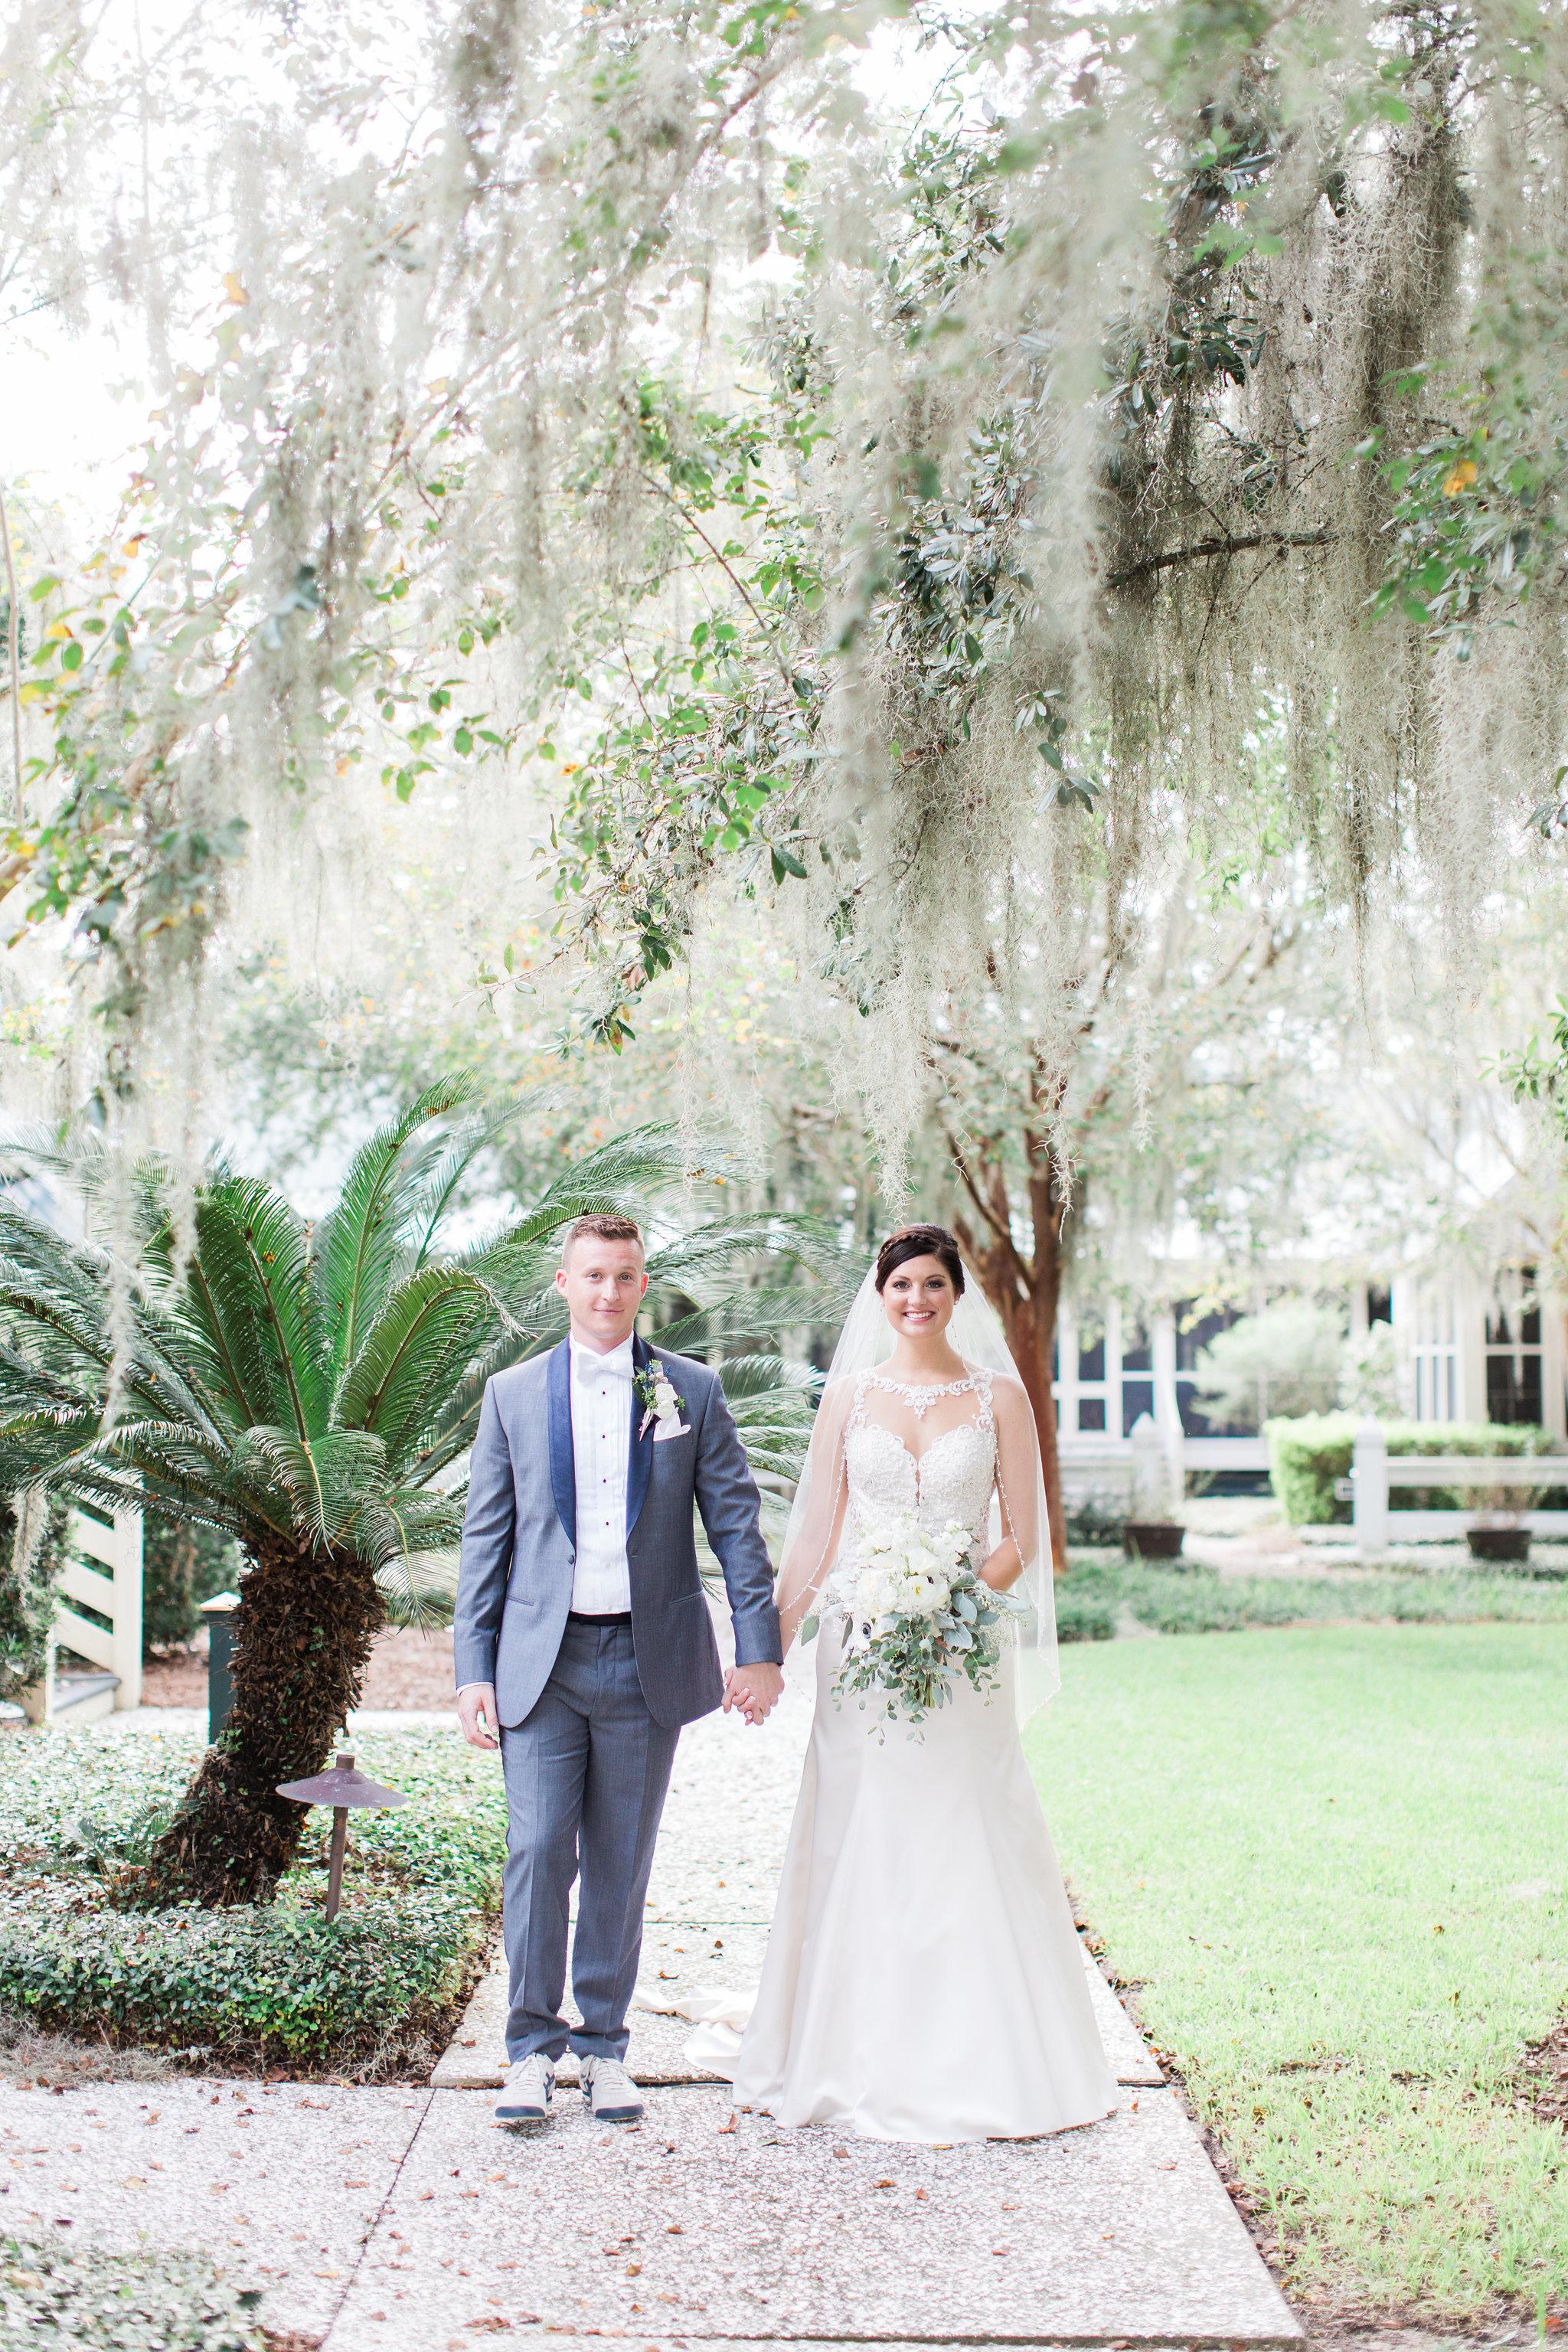 apt-b-photography-lauren-graham-oldfield-wedding-south-carolina-wedding-photographer-savannah-wedding-lowcountry-wedding-coastal-wedding-first-look-15.JPG